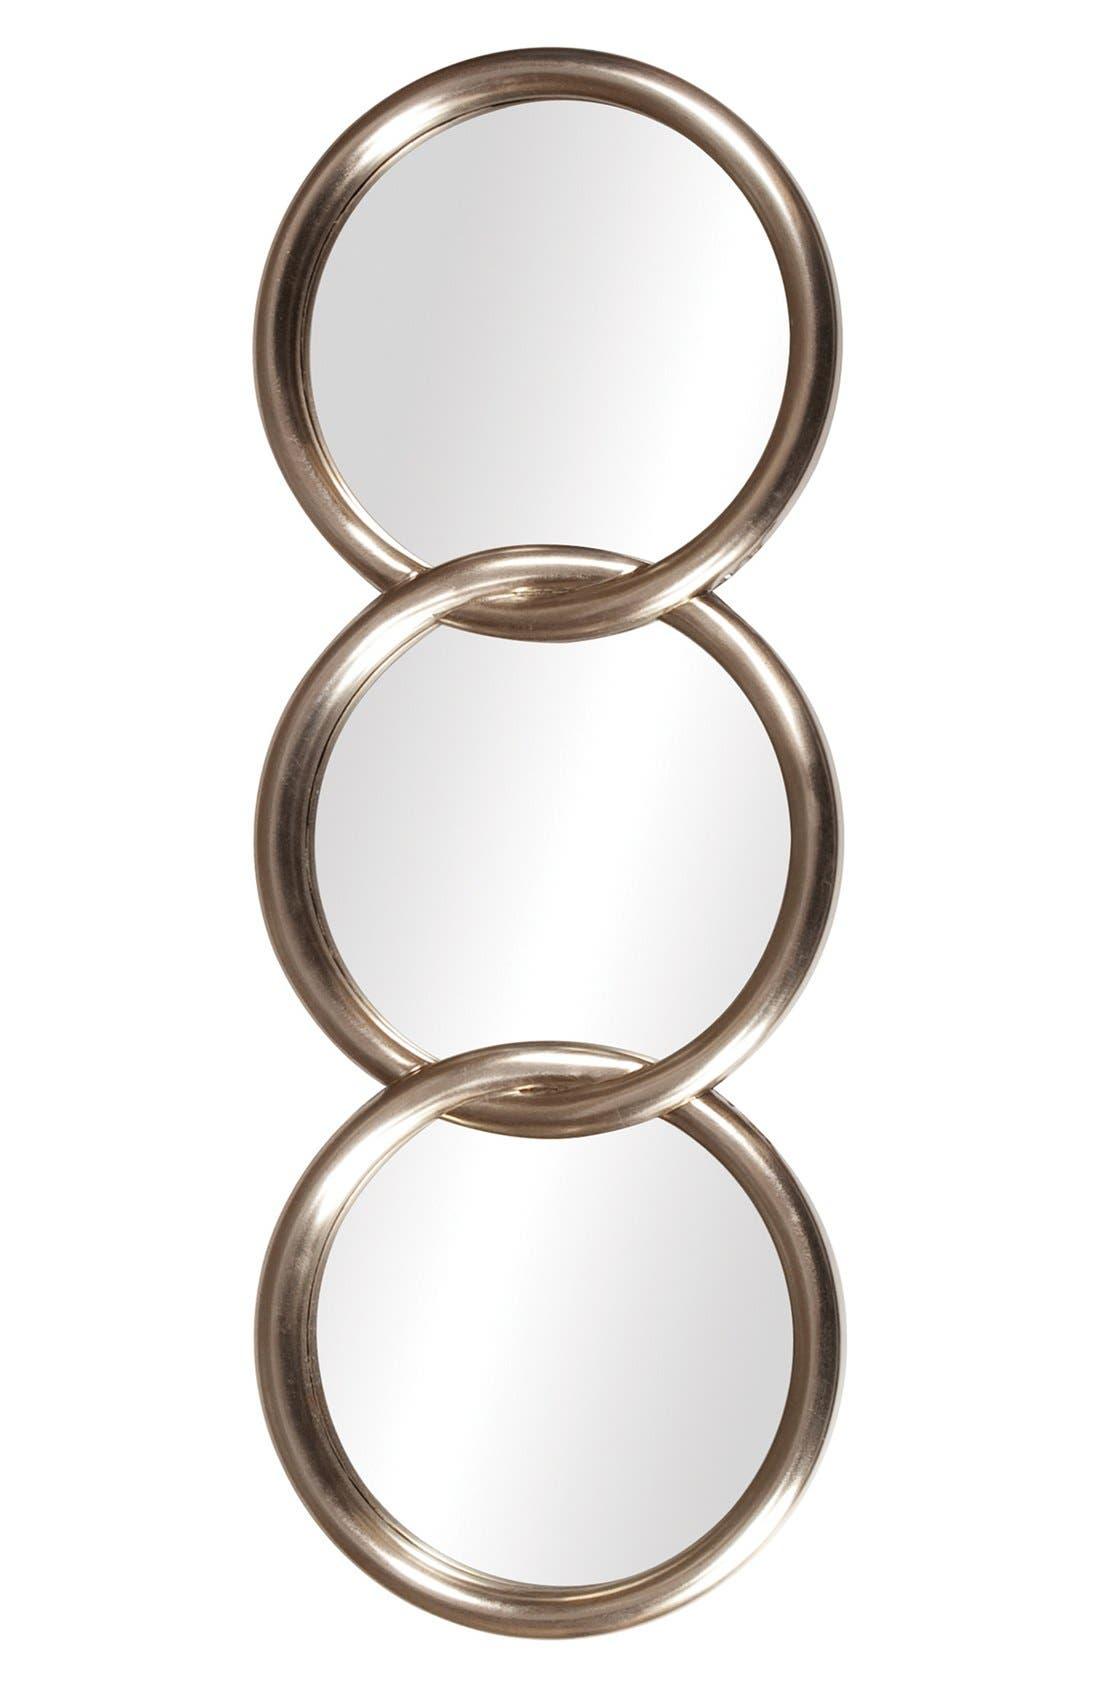 Main Image - Howard Elliott Collection 'Mercer' Mirror